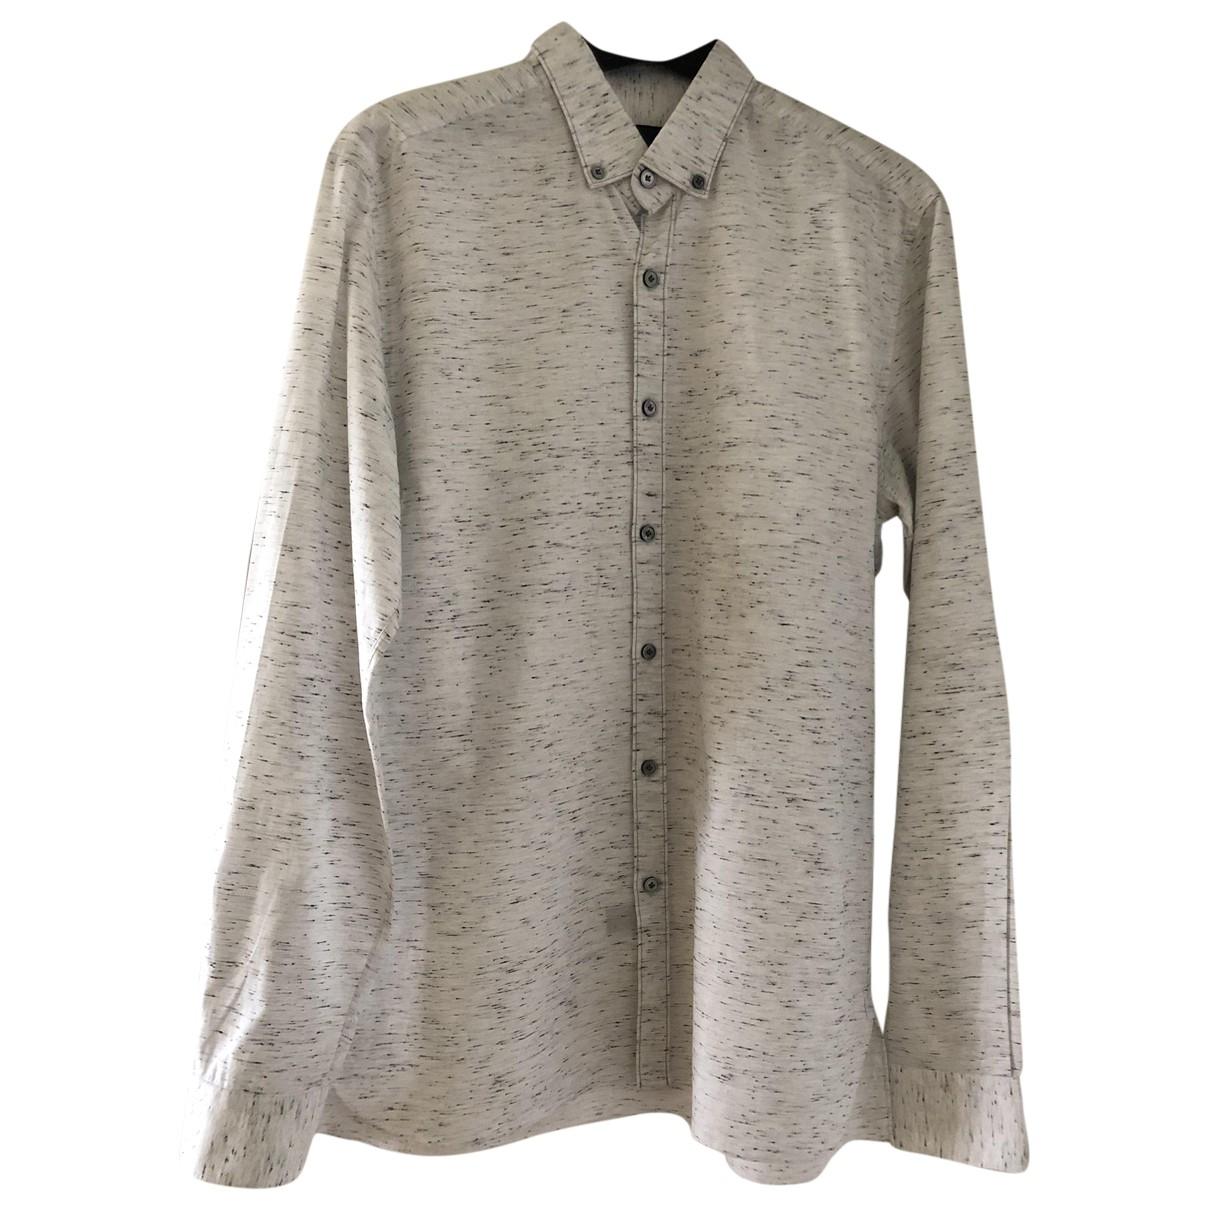 Lanvin \N White Cotton Shirts for Men 40 EU (tour de cou / collar)